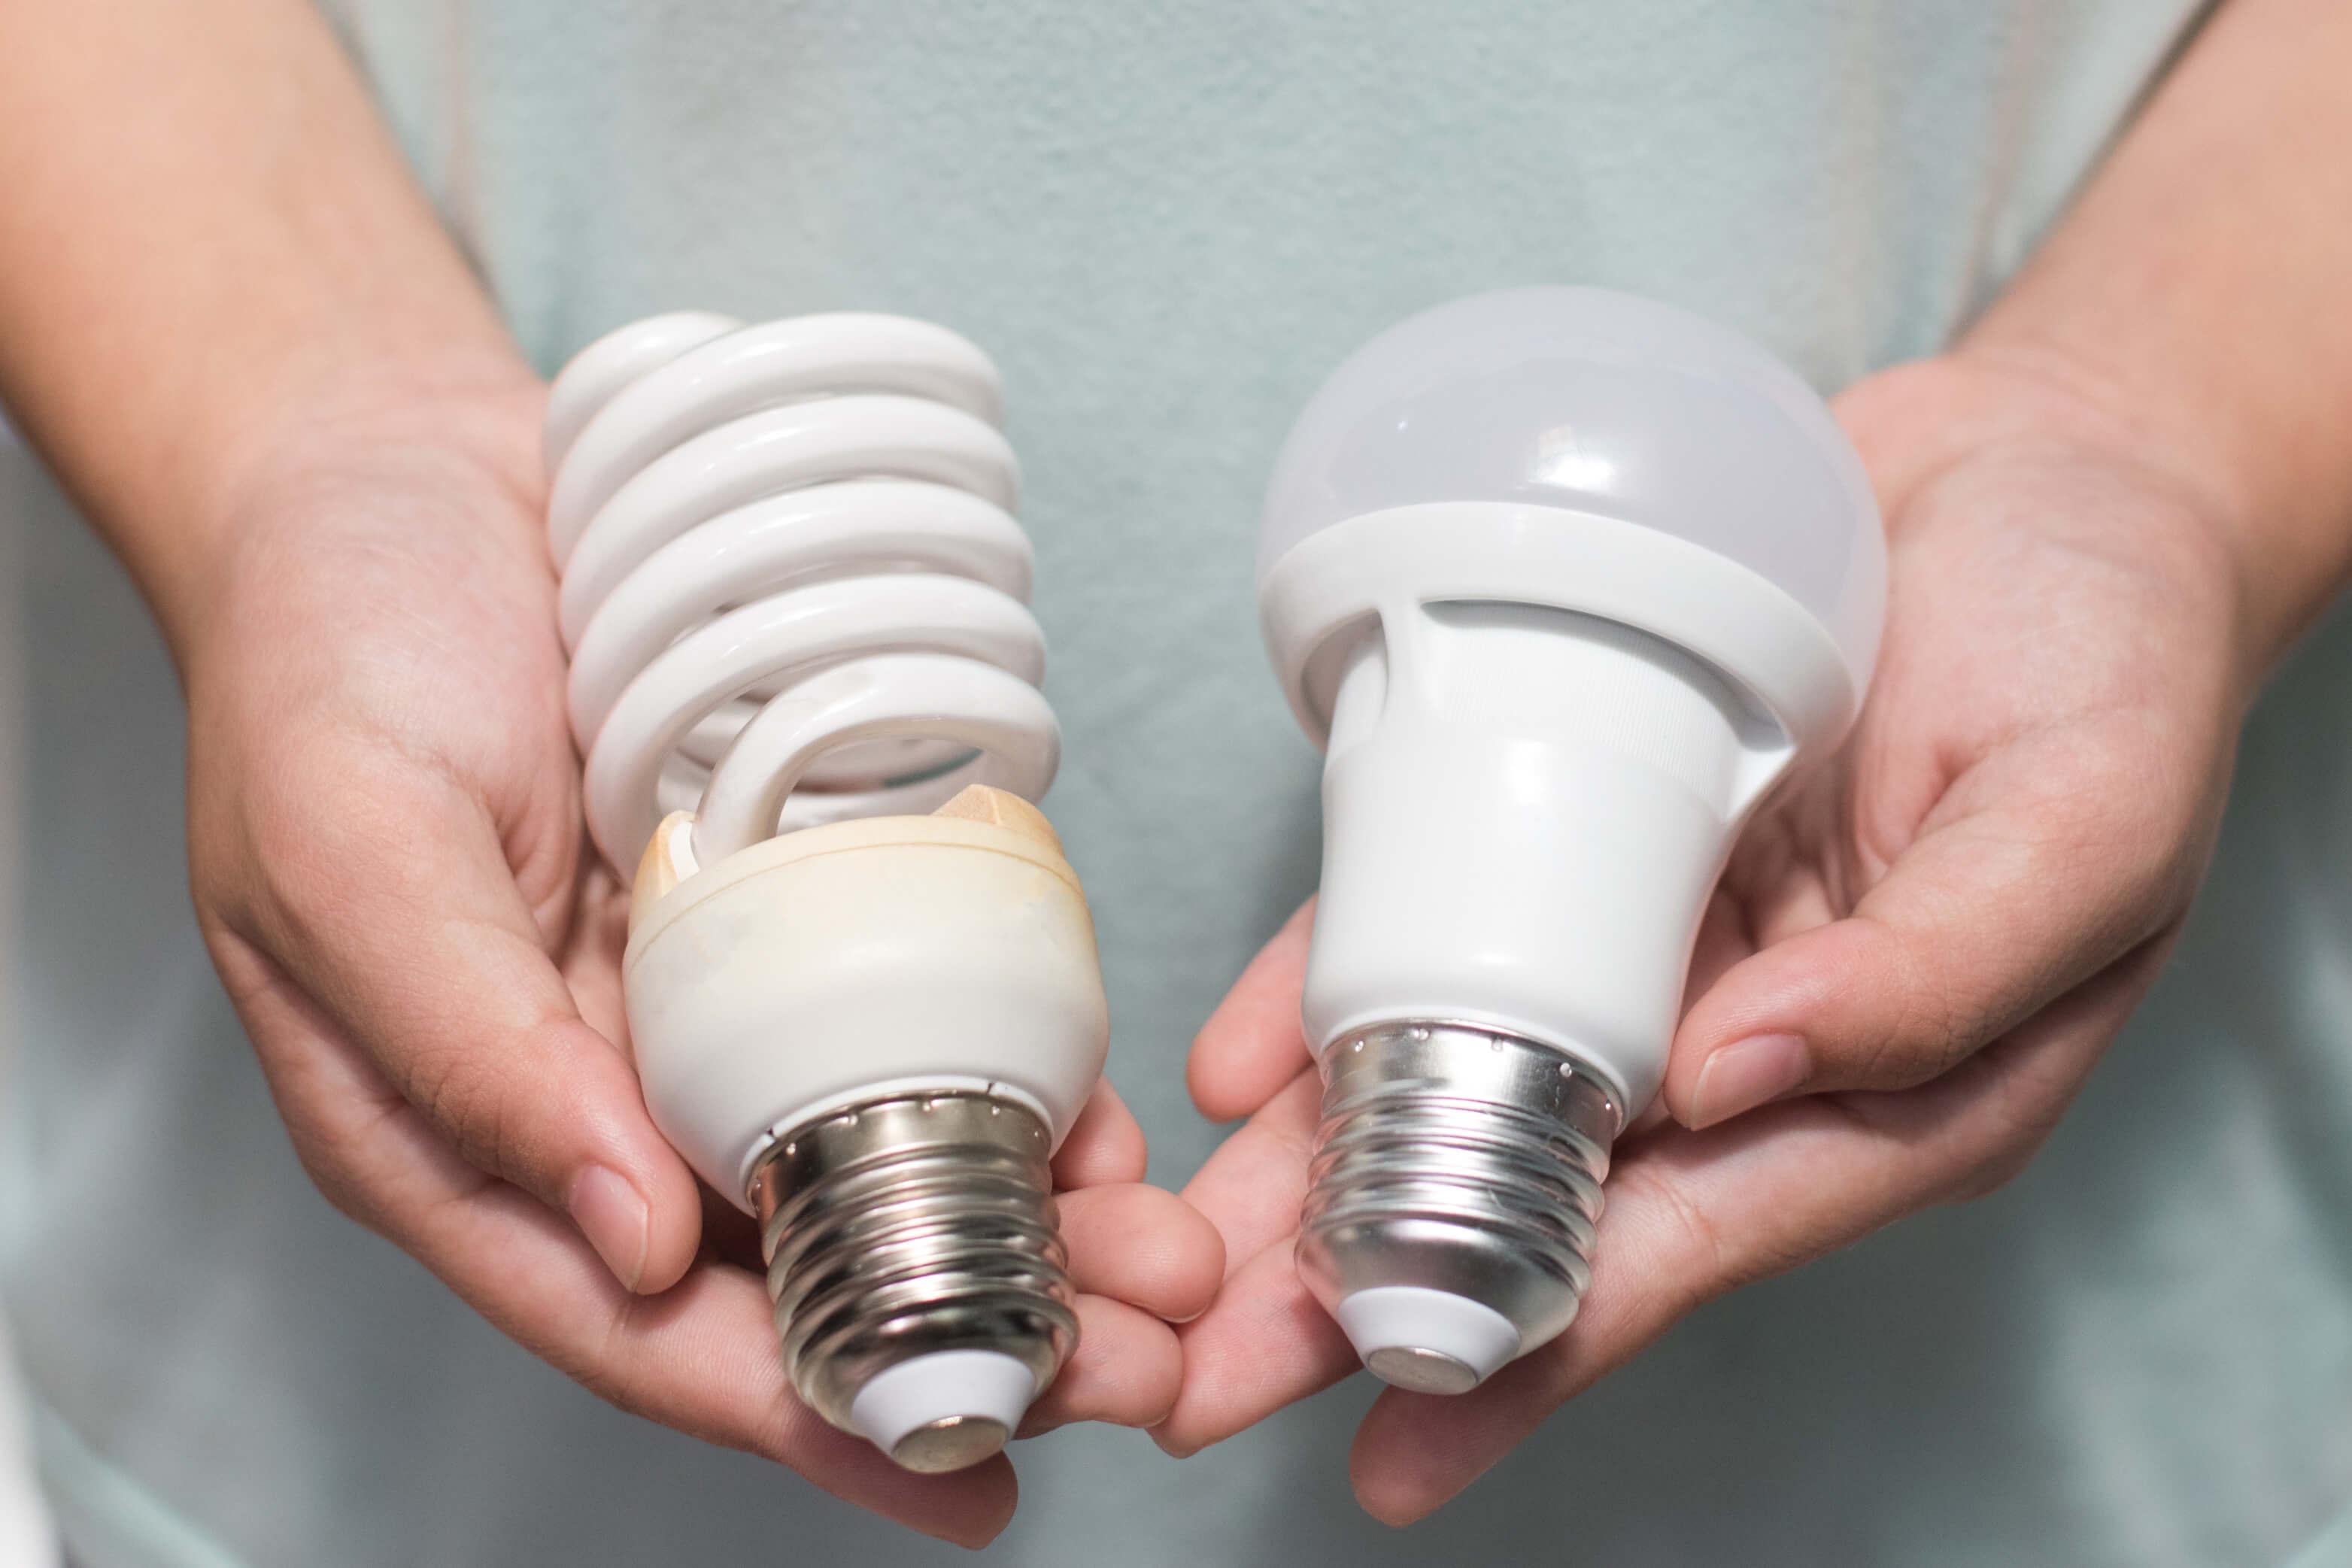 Pair of hands holding energy saving light bulbs